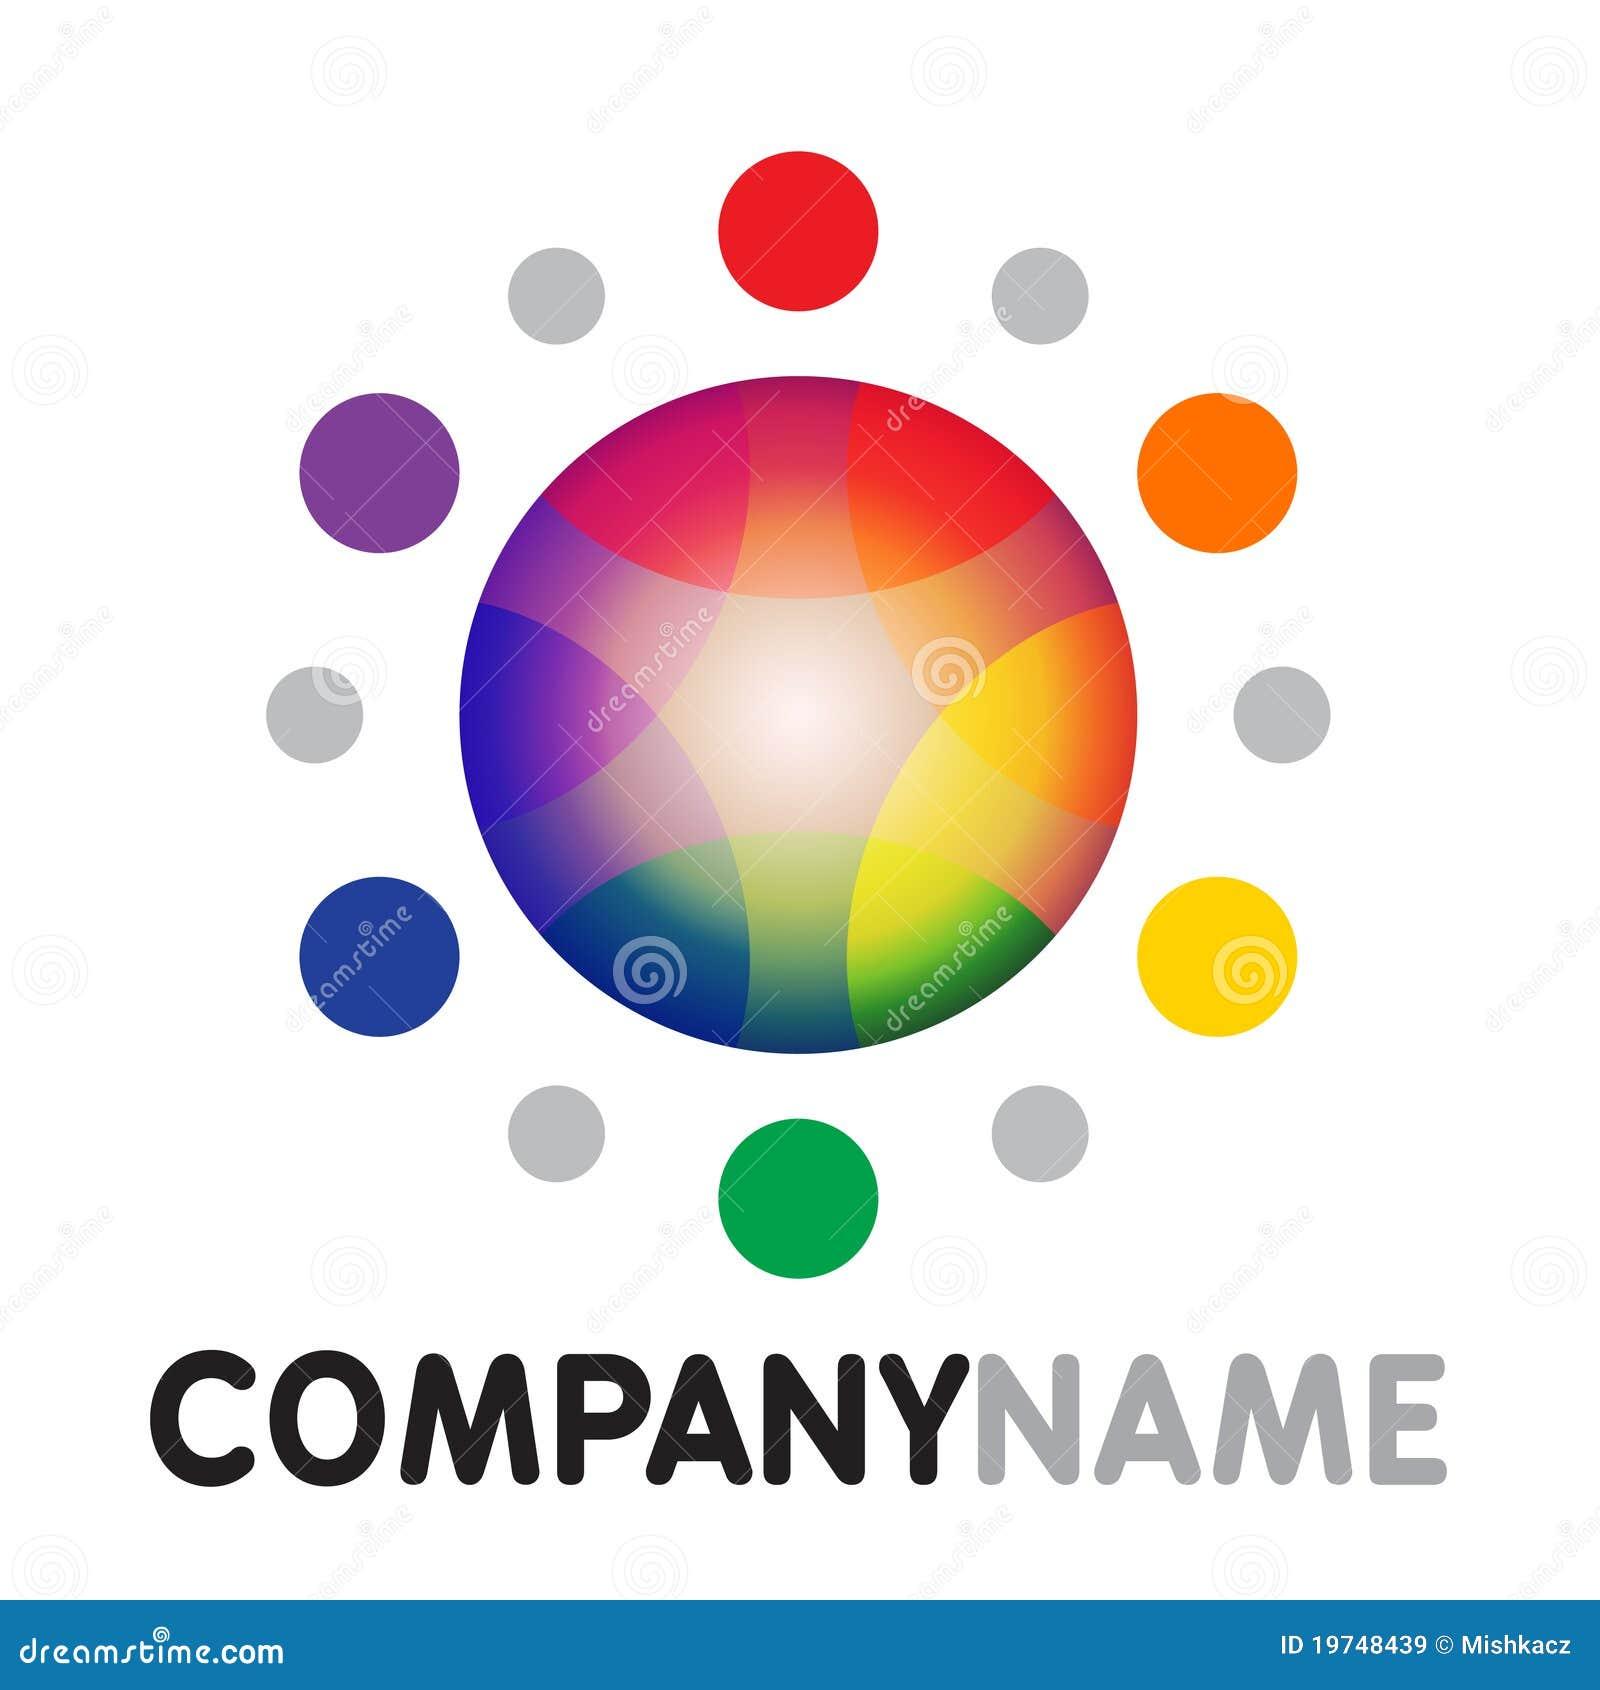 Rainbow sun icon and logo design